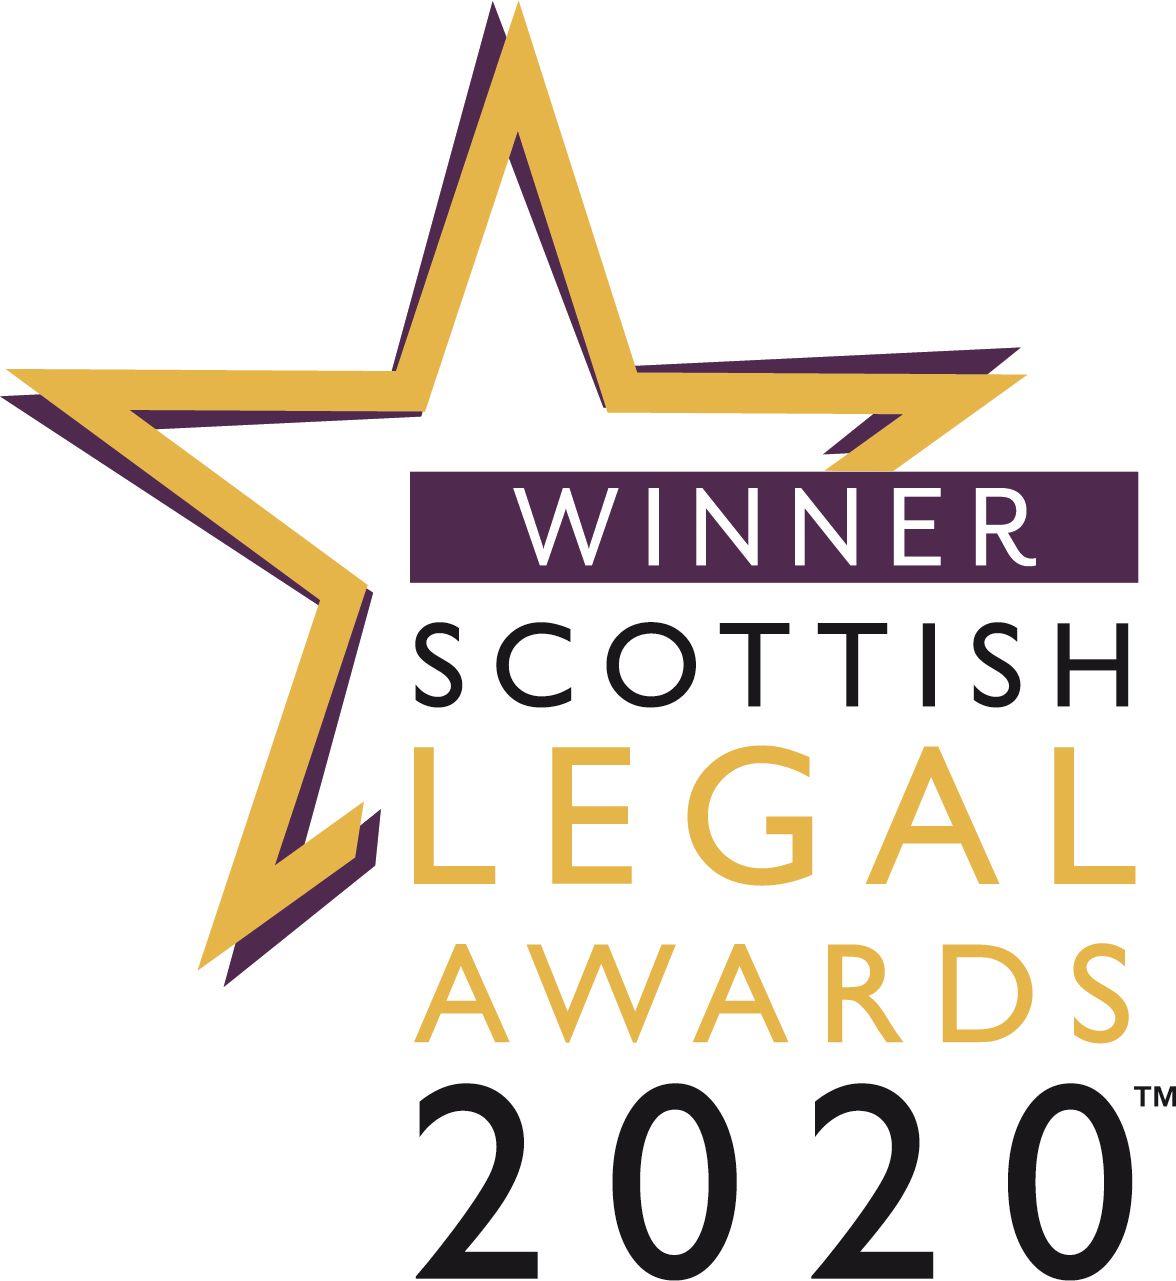 Scottish Legal Awards 2020 winners